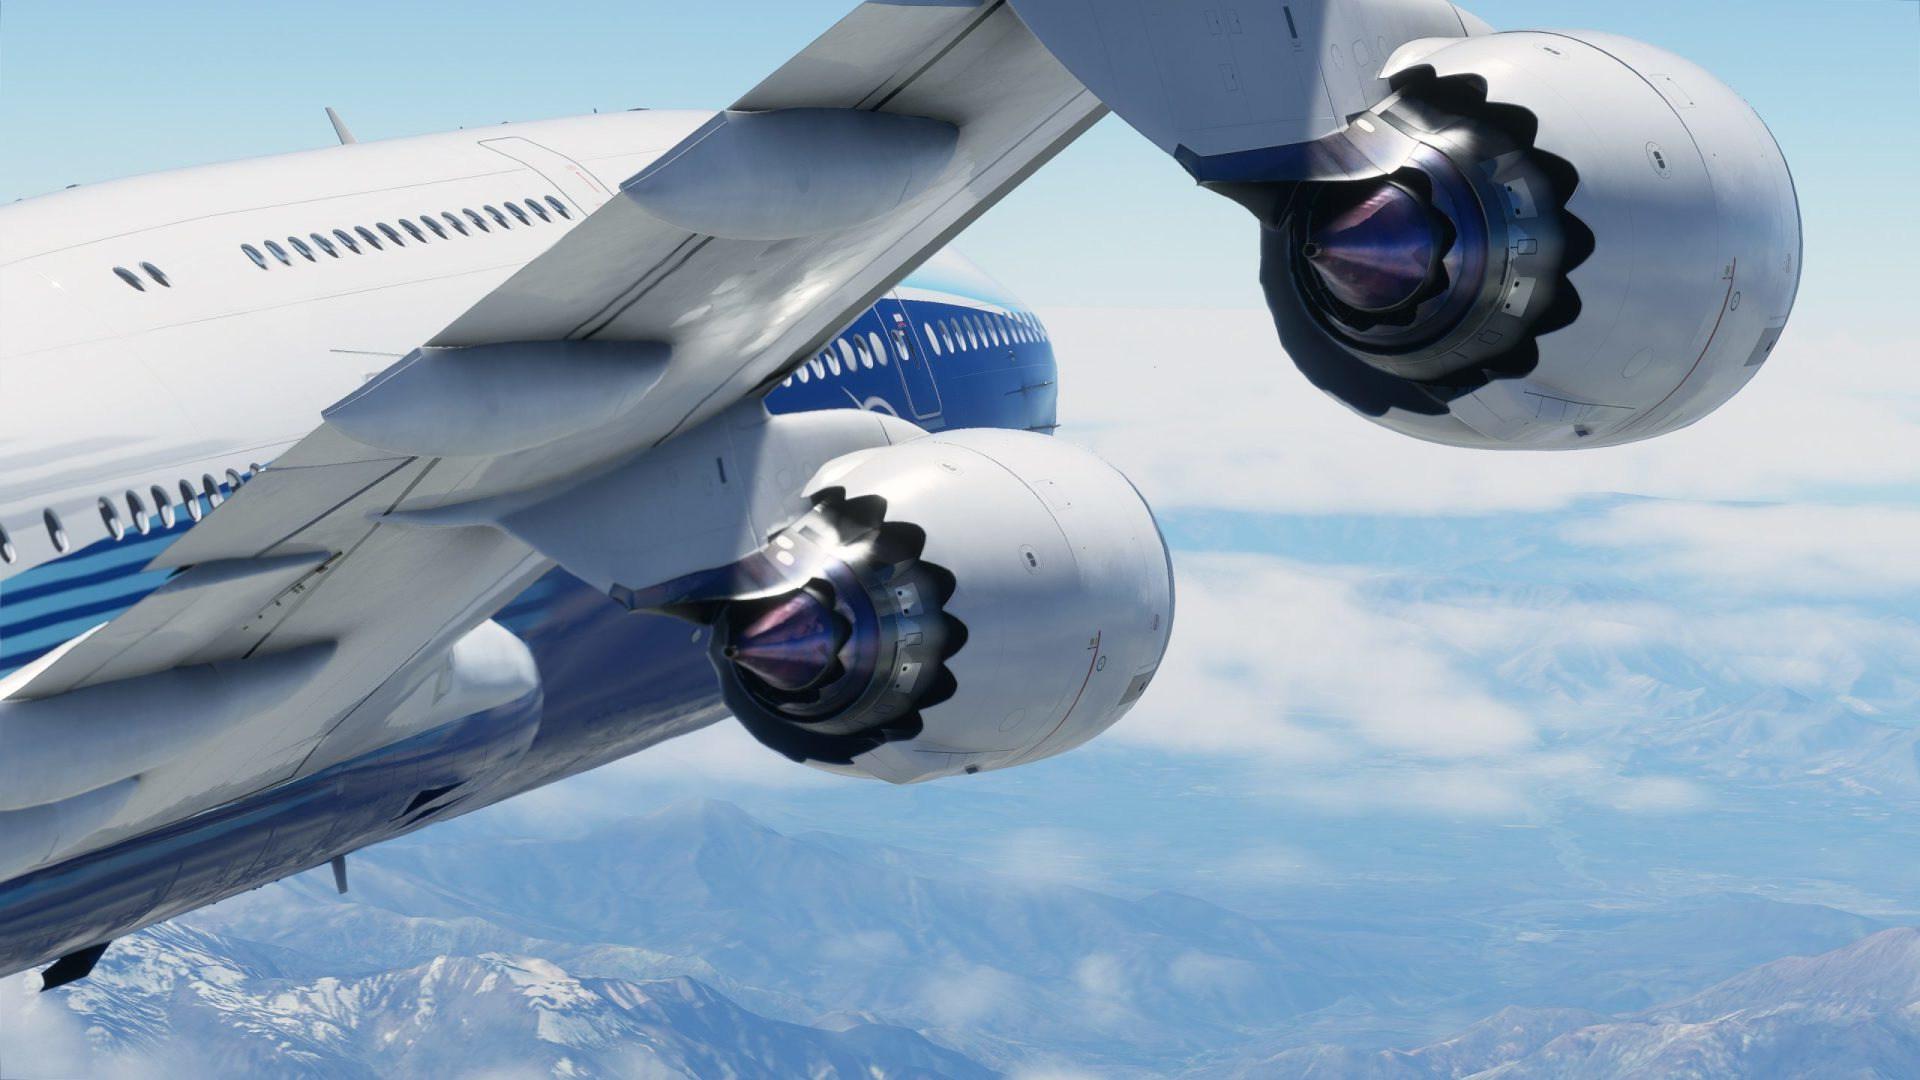 Microsoft, Gaming, Spiele, Games, Flugzeug, flugsimulation, Flight Simulator 2020, Screenshots, Turbine, Boeing 747-8i